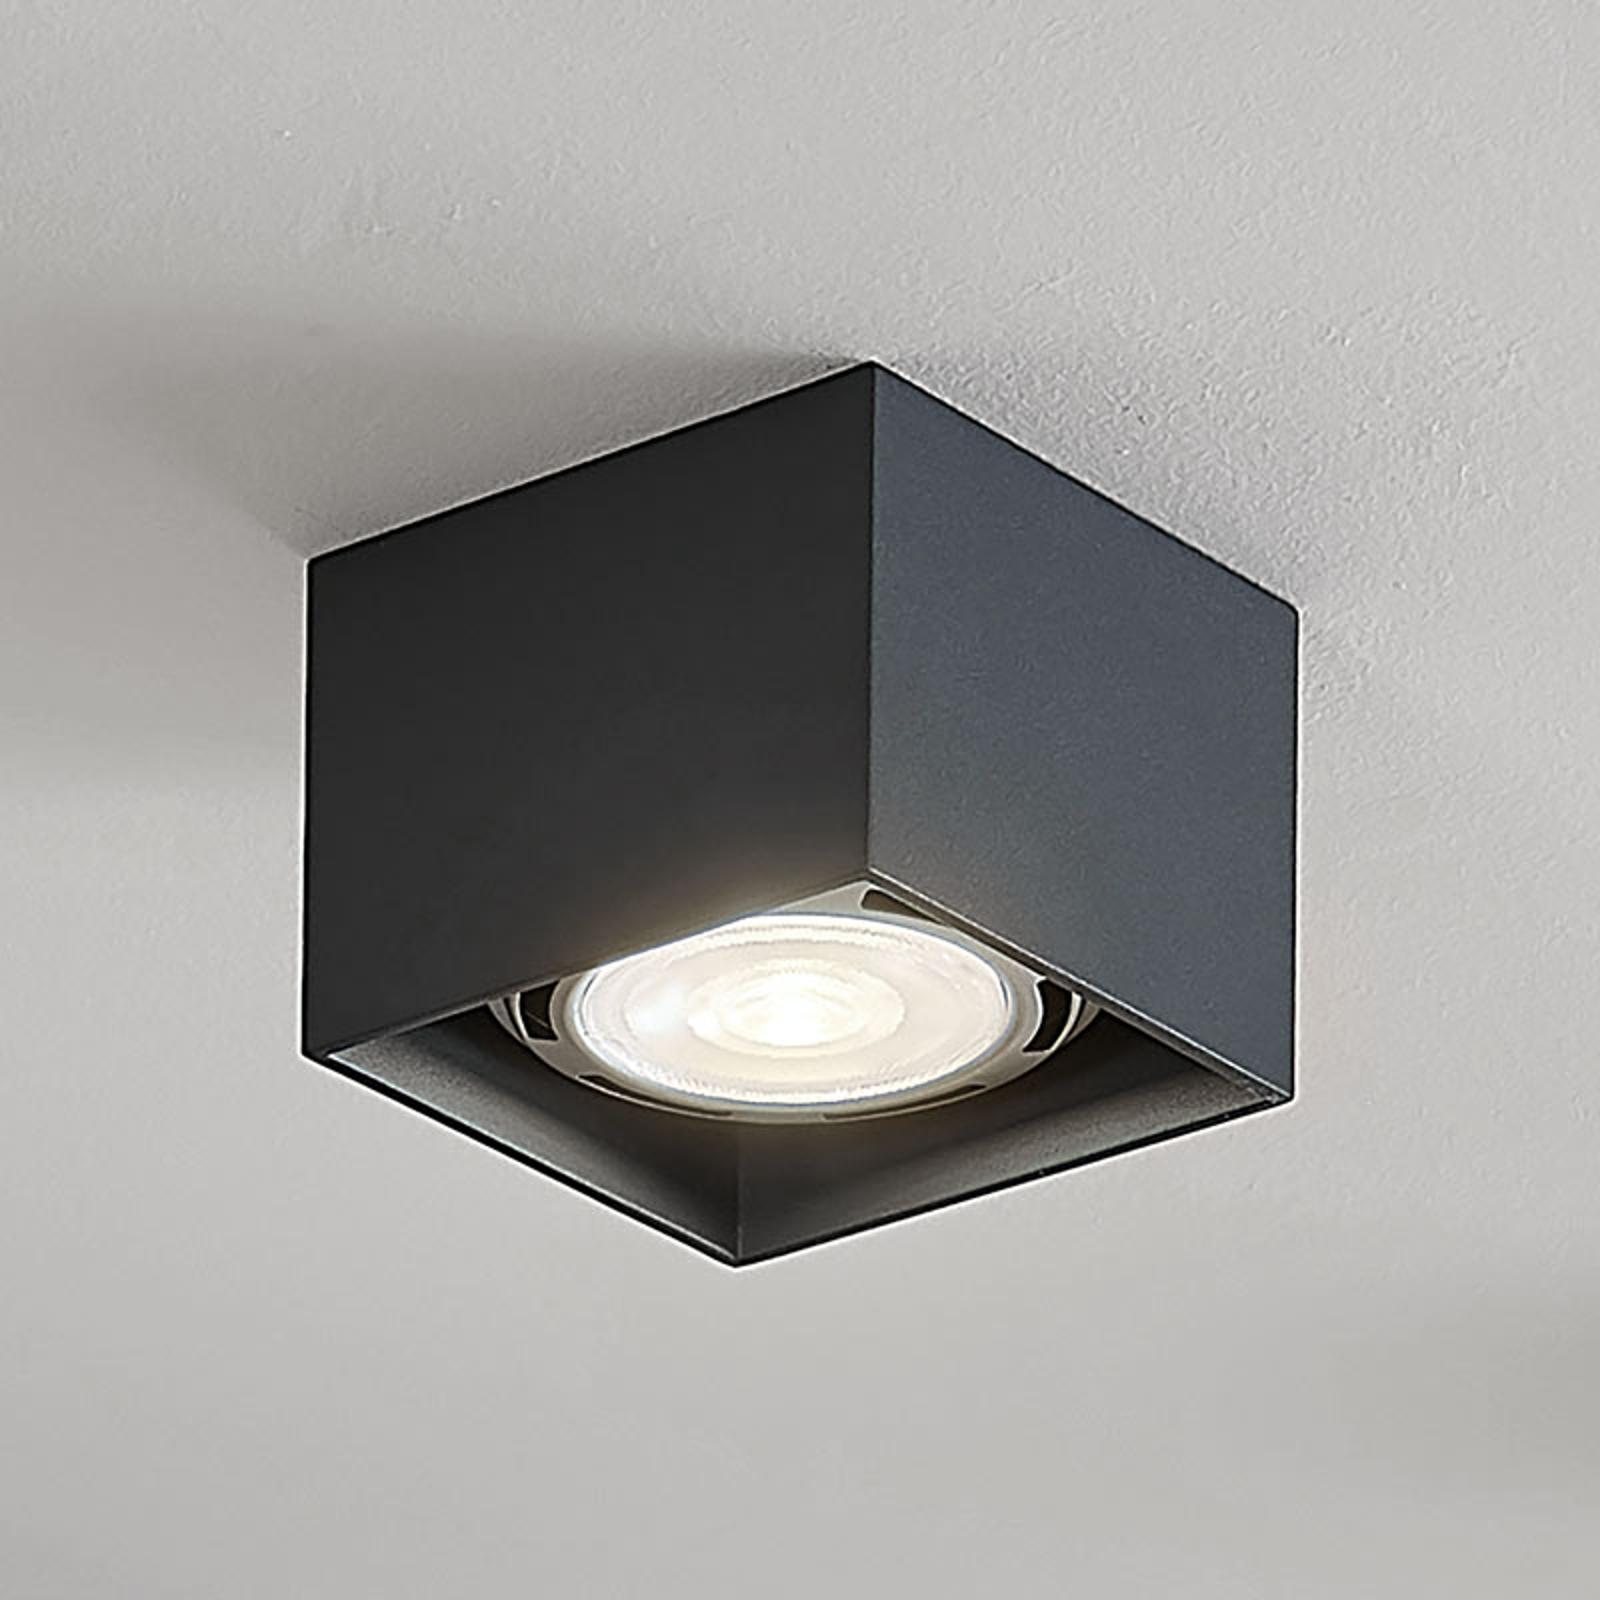 Spot sufitowy LED Mabel, kanciasty, ciemnoszary